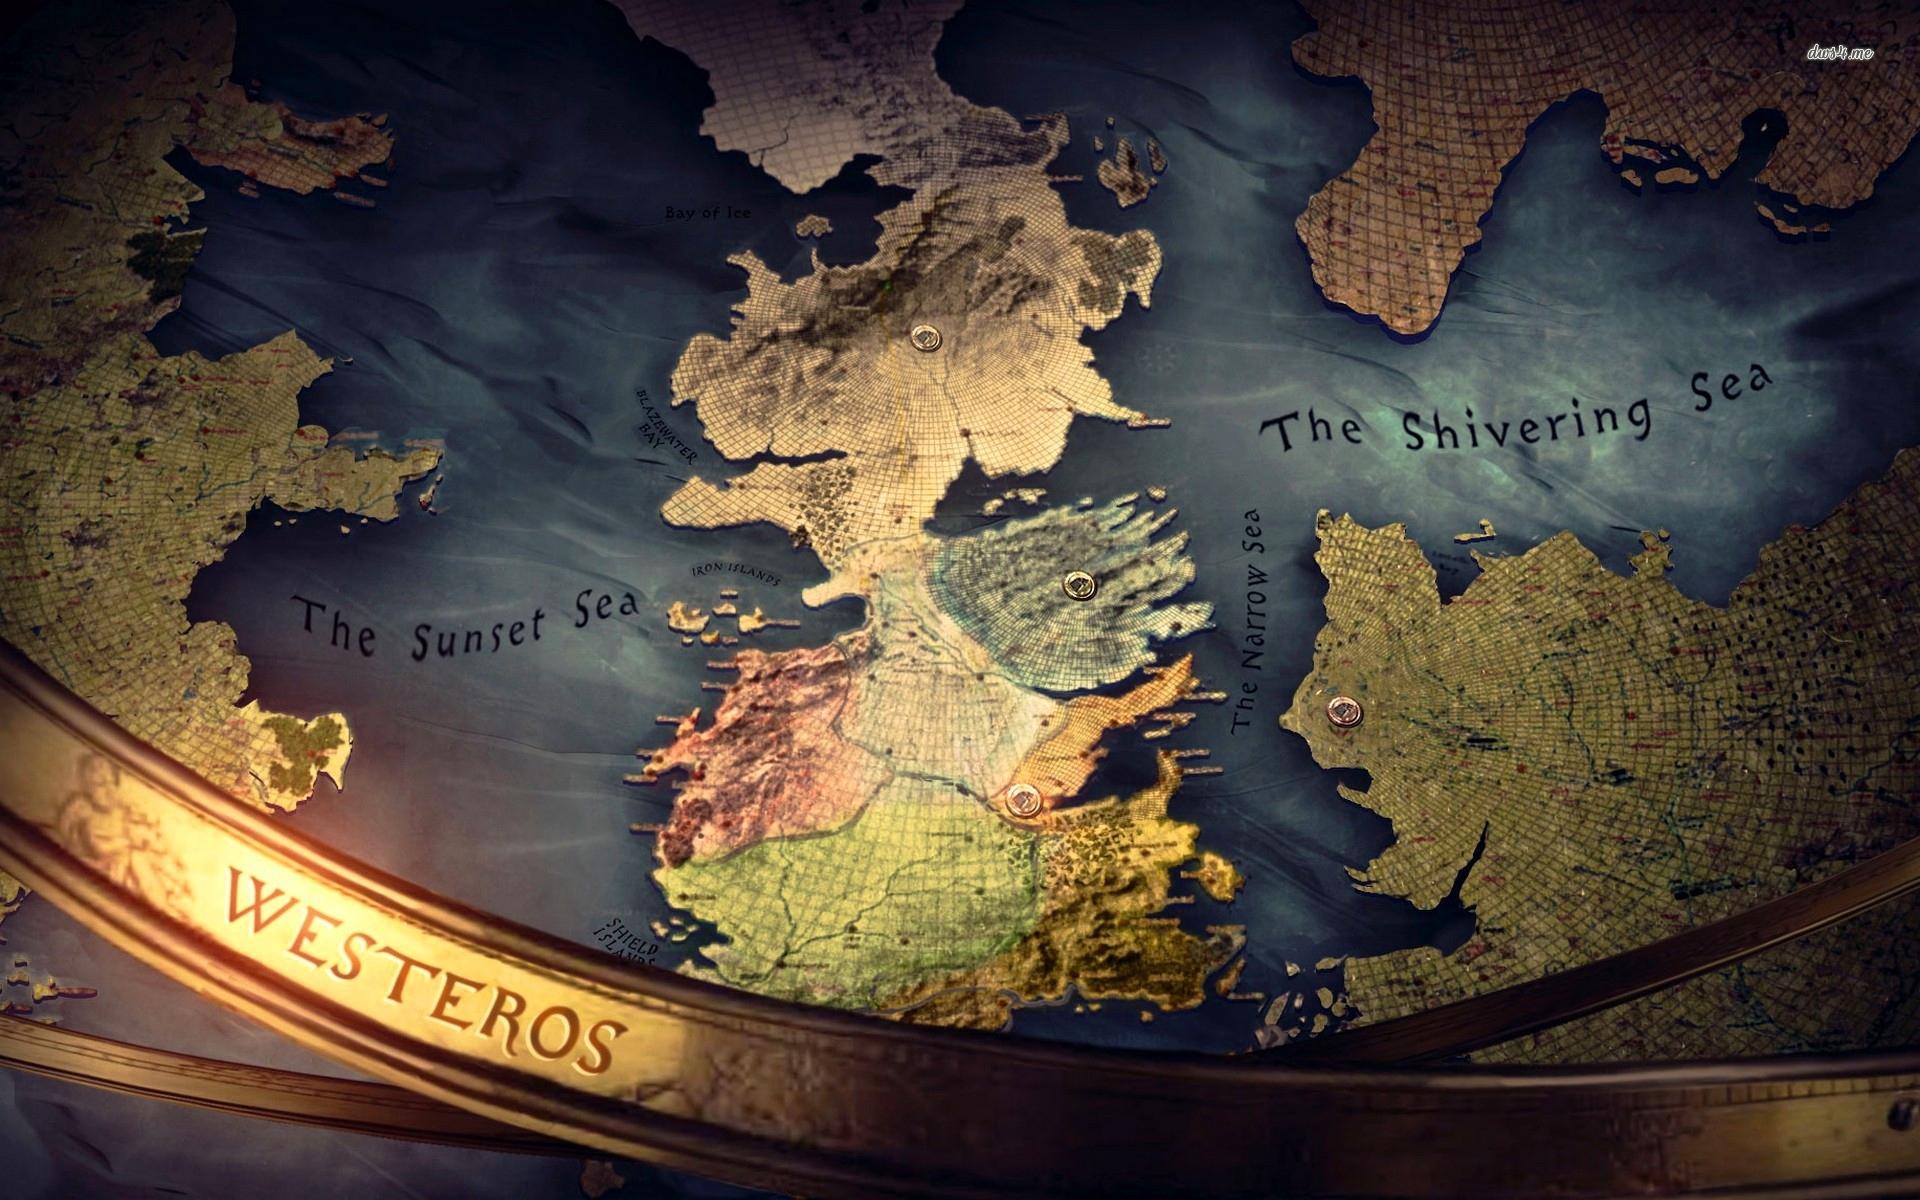 game of thrones karte wallpaper Game of Thrones Wallpaper Map   WallpaperSafari